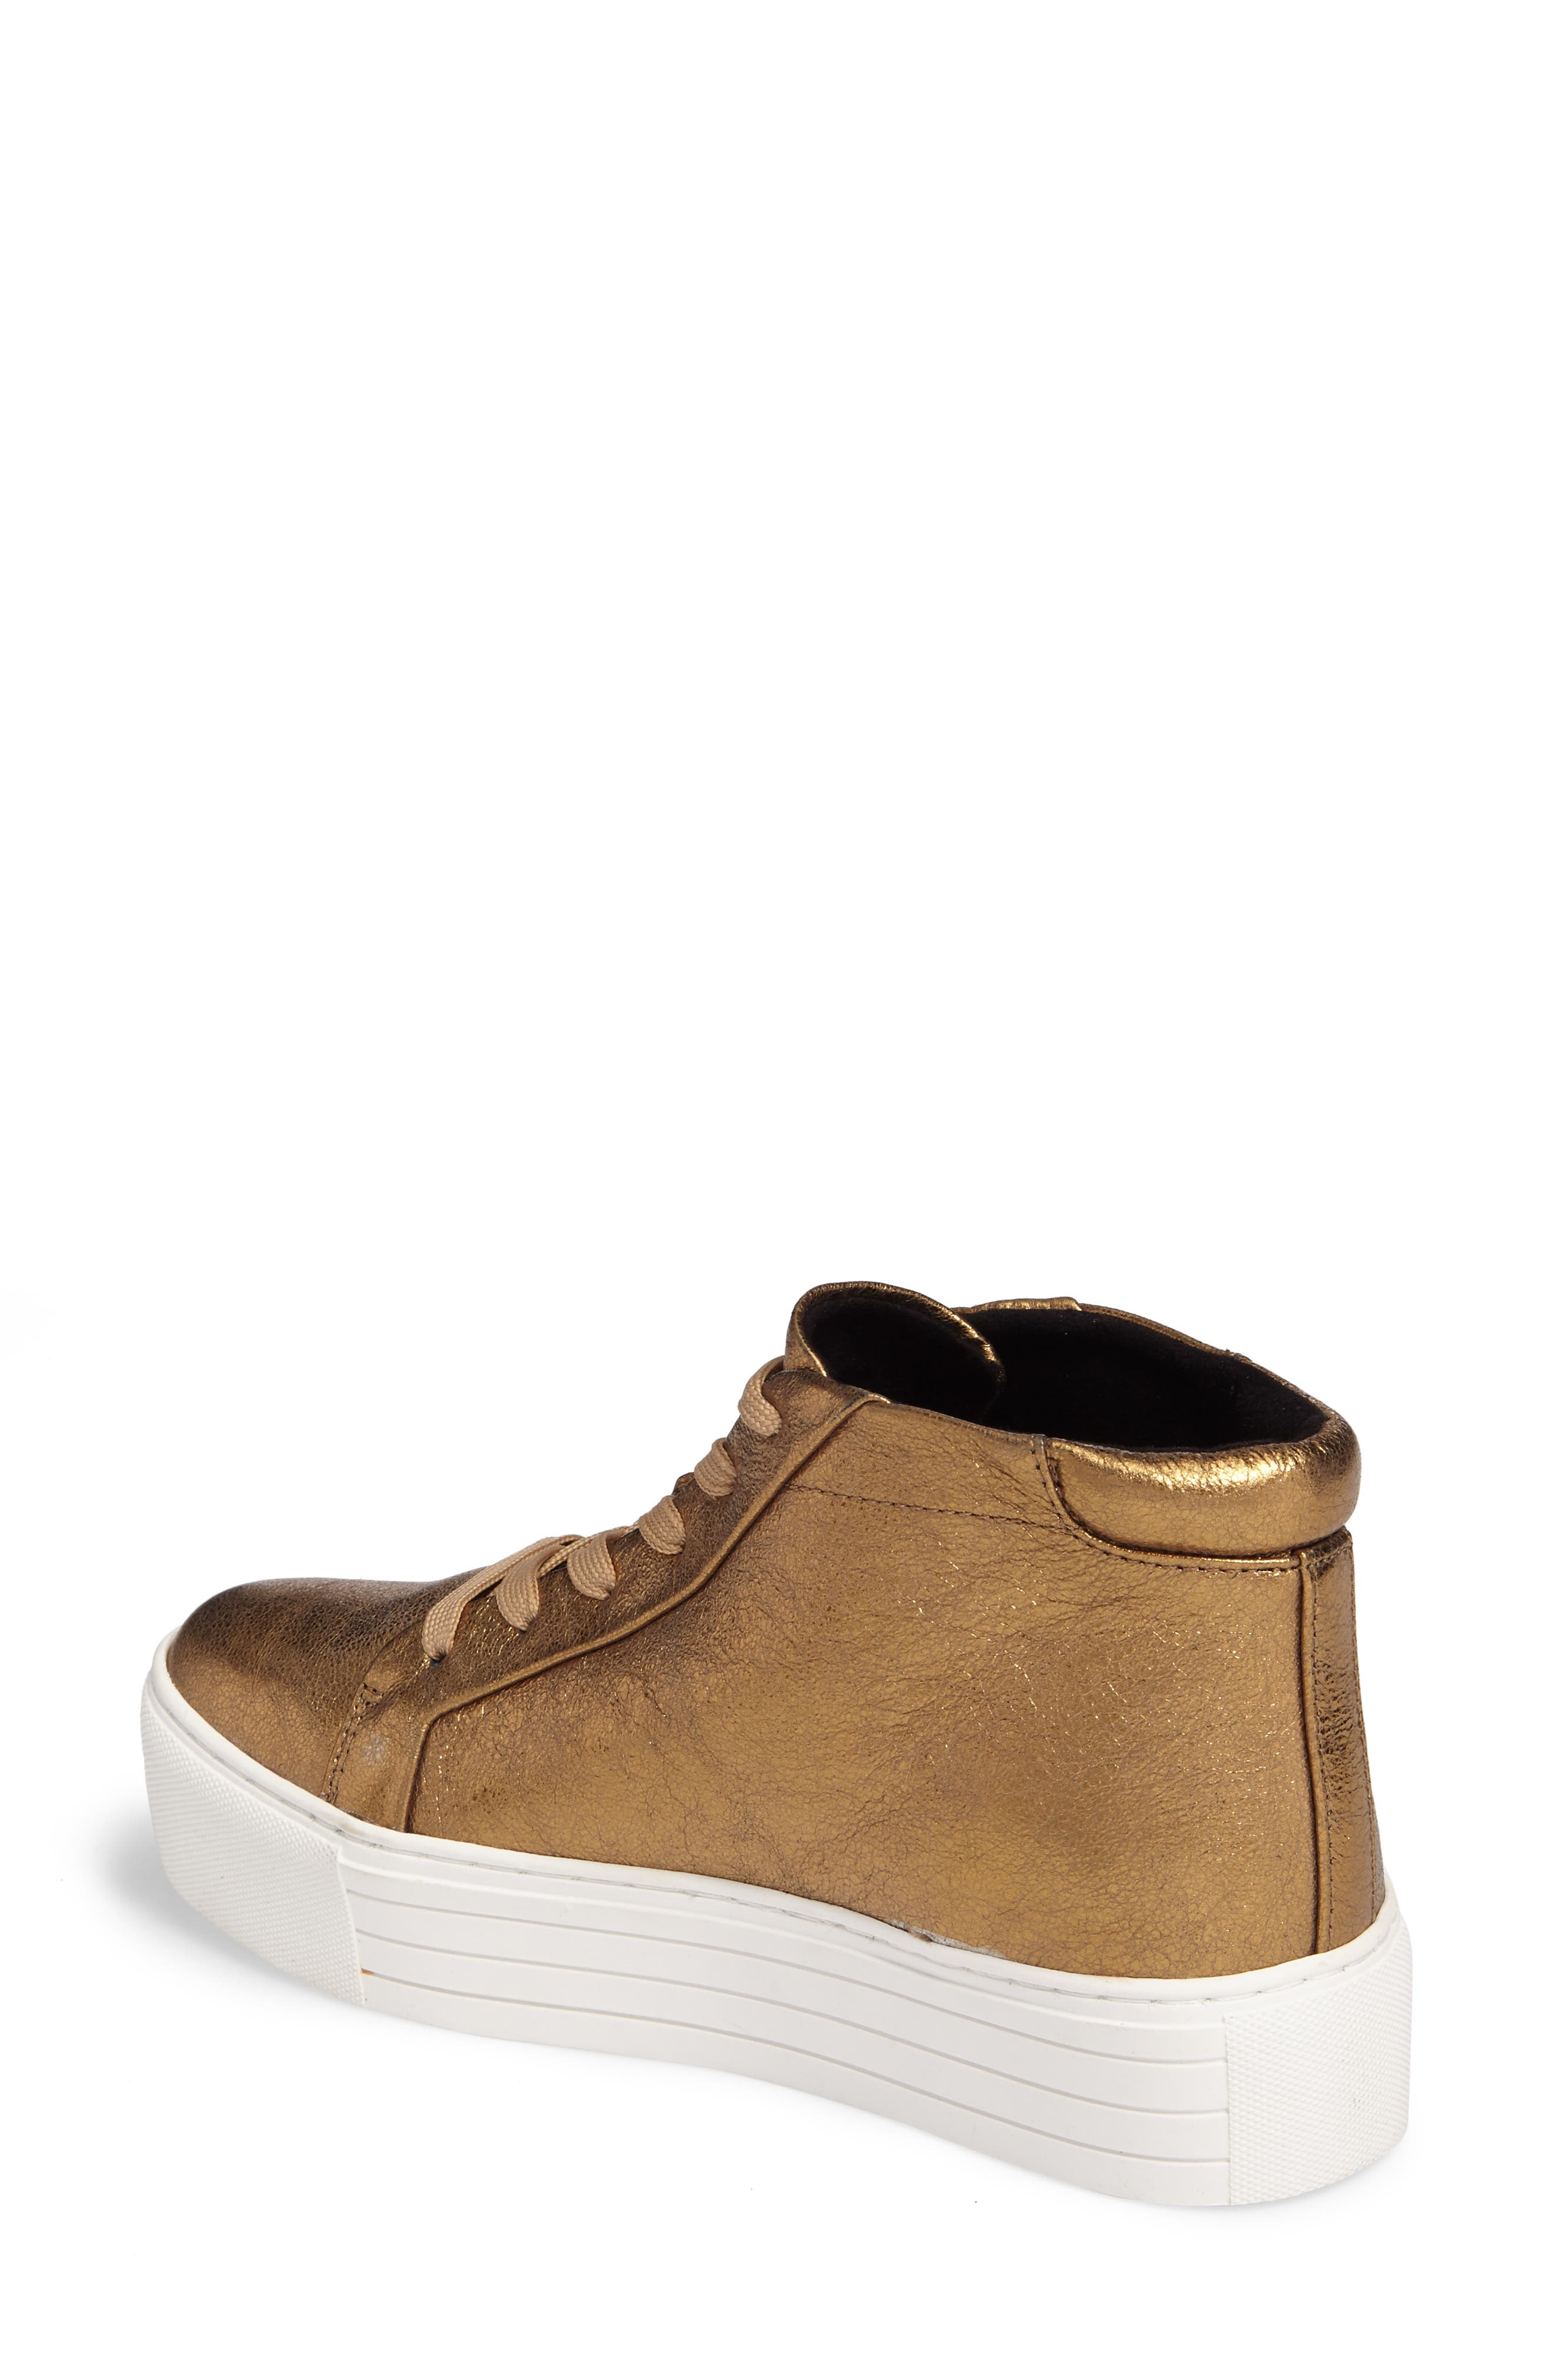 Alternate Image 2  - Kenneth Cole New York Janette High Top Platform Sneaker (Women)